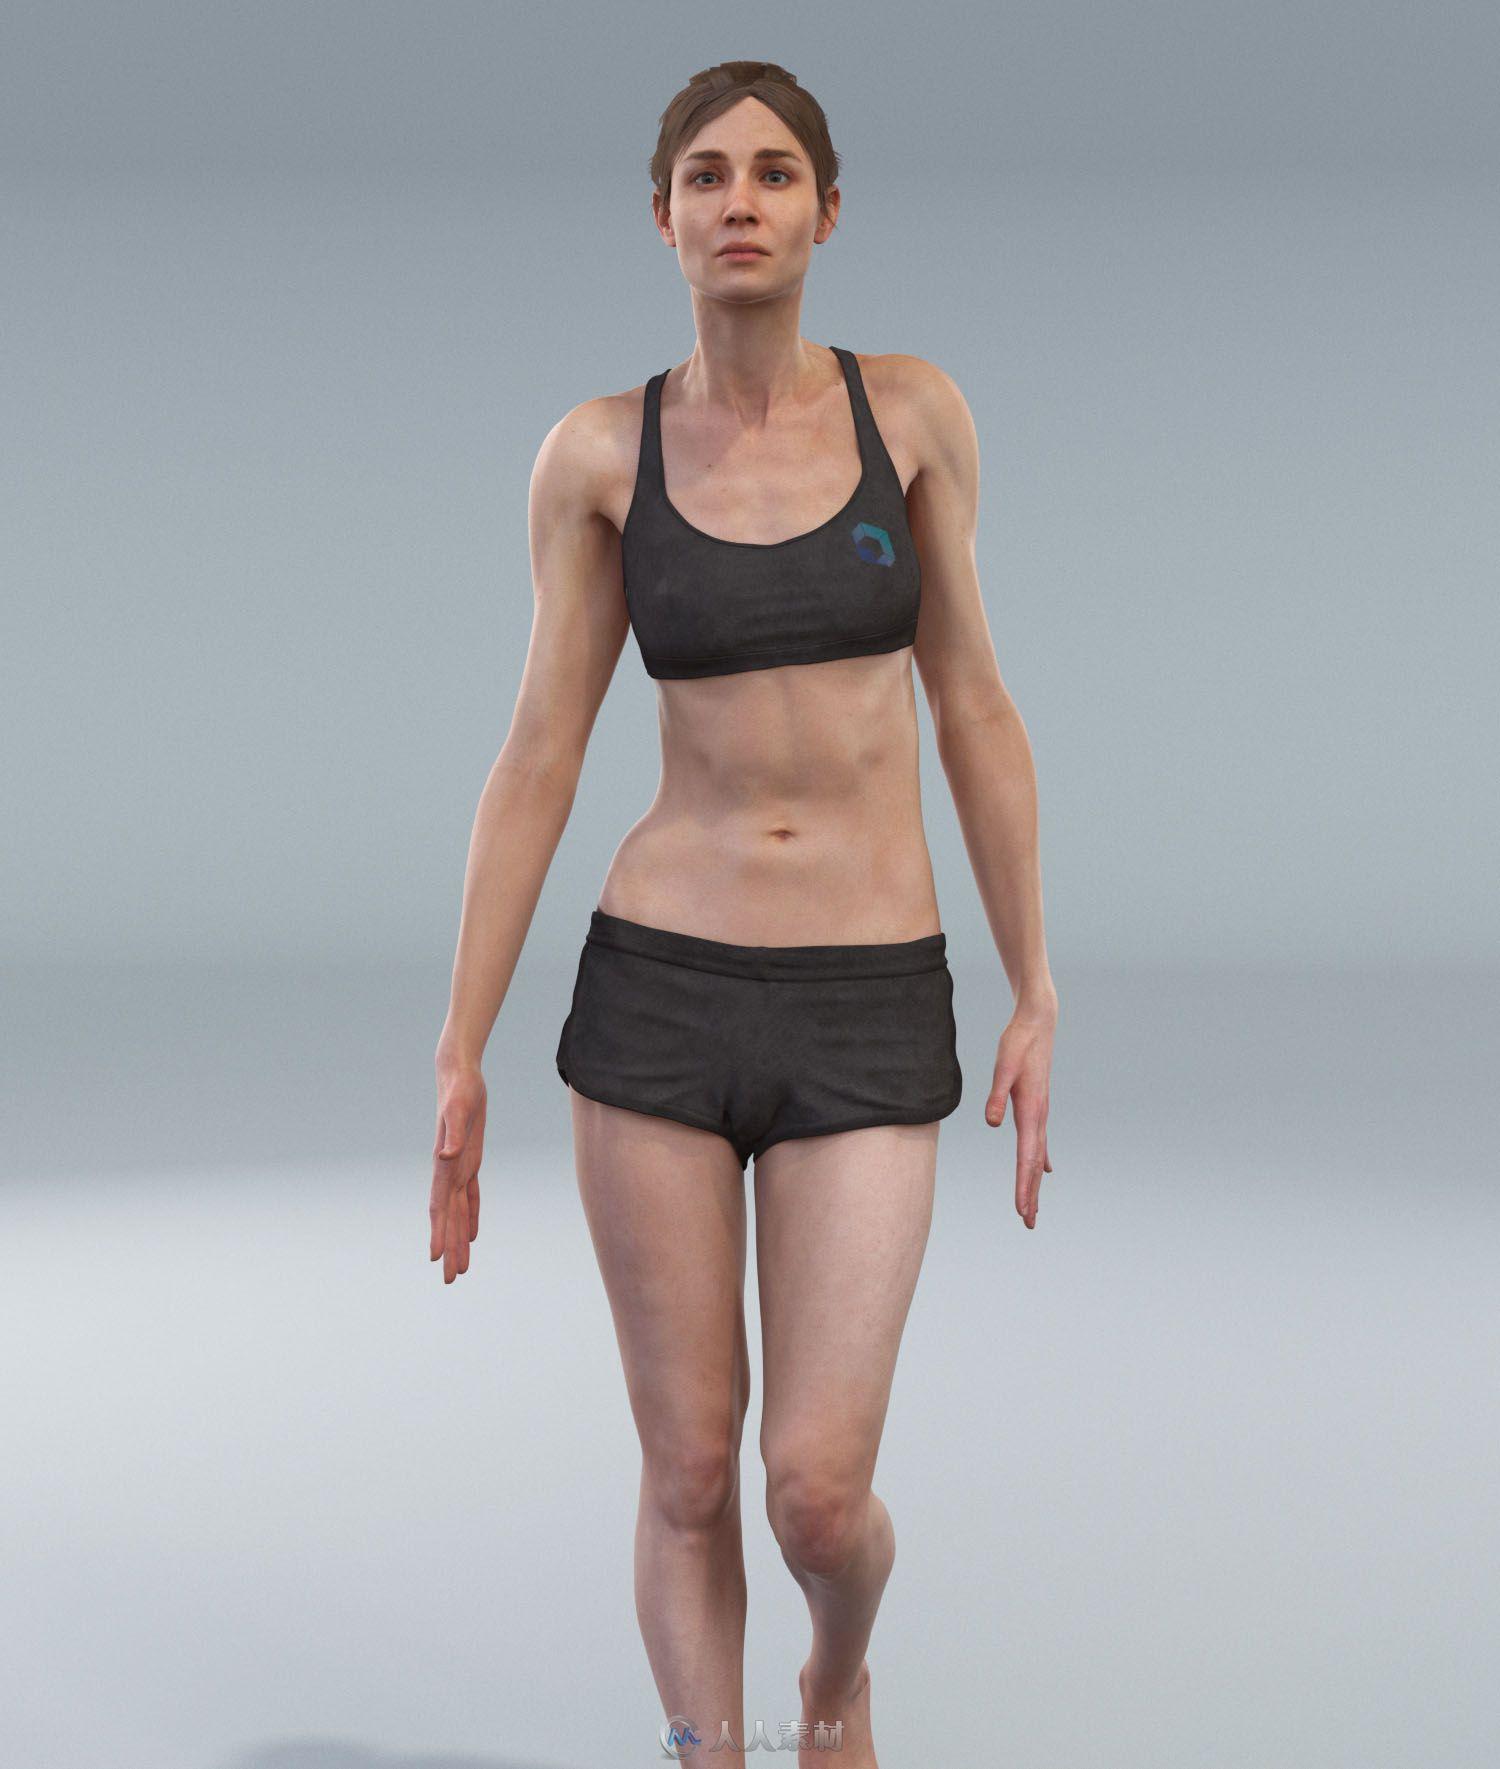 Ziva Dynamics Ziva VFX骨骼肌肉运动模拟Maya插件V1.6版40 / 作者:抱着猫的老鼠 / 帖子ID:16755361,5650261